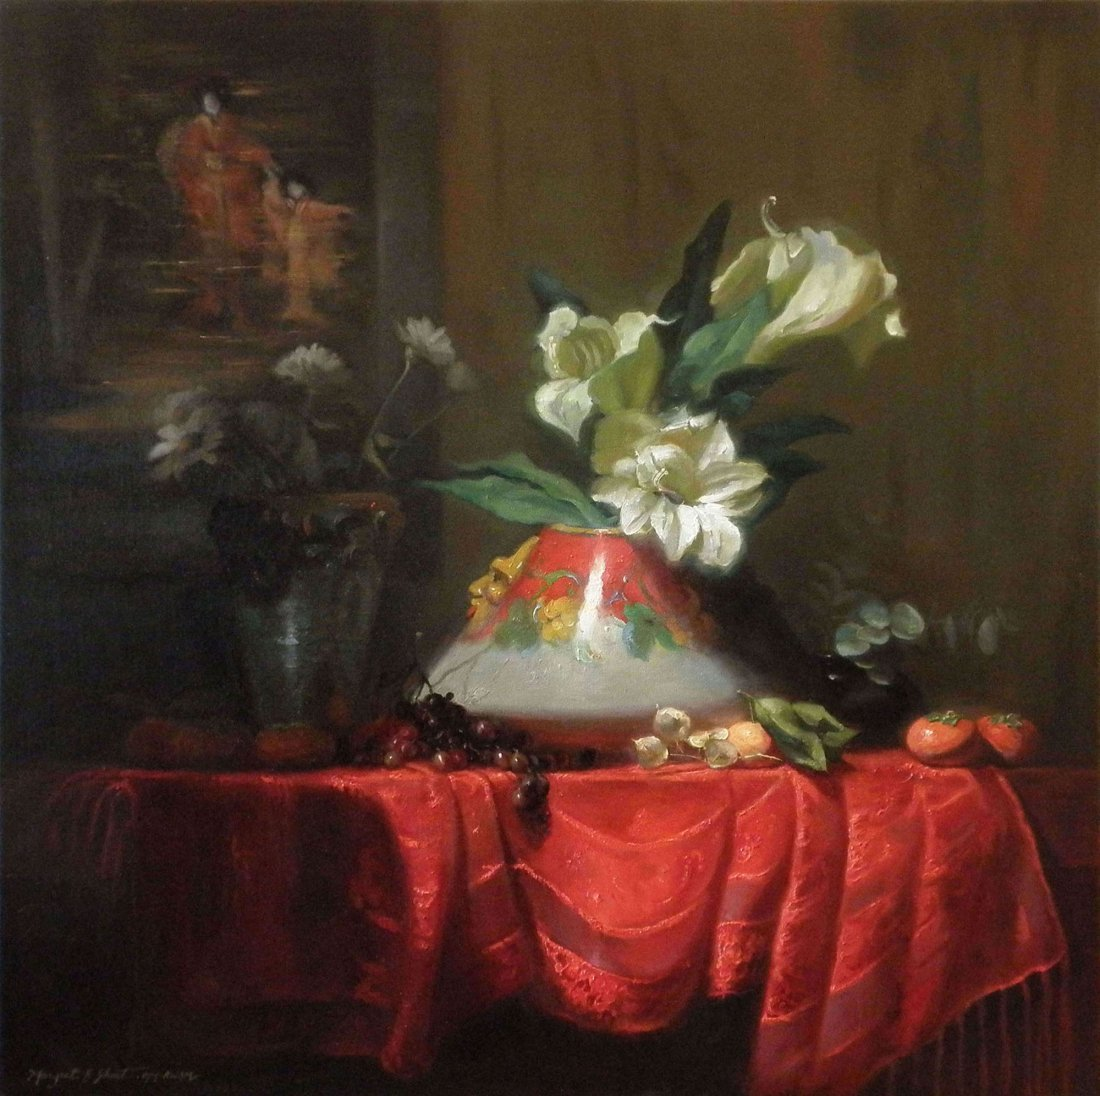 """Deruta Delivery"" by Margret Short OPA"